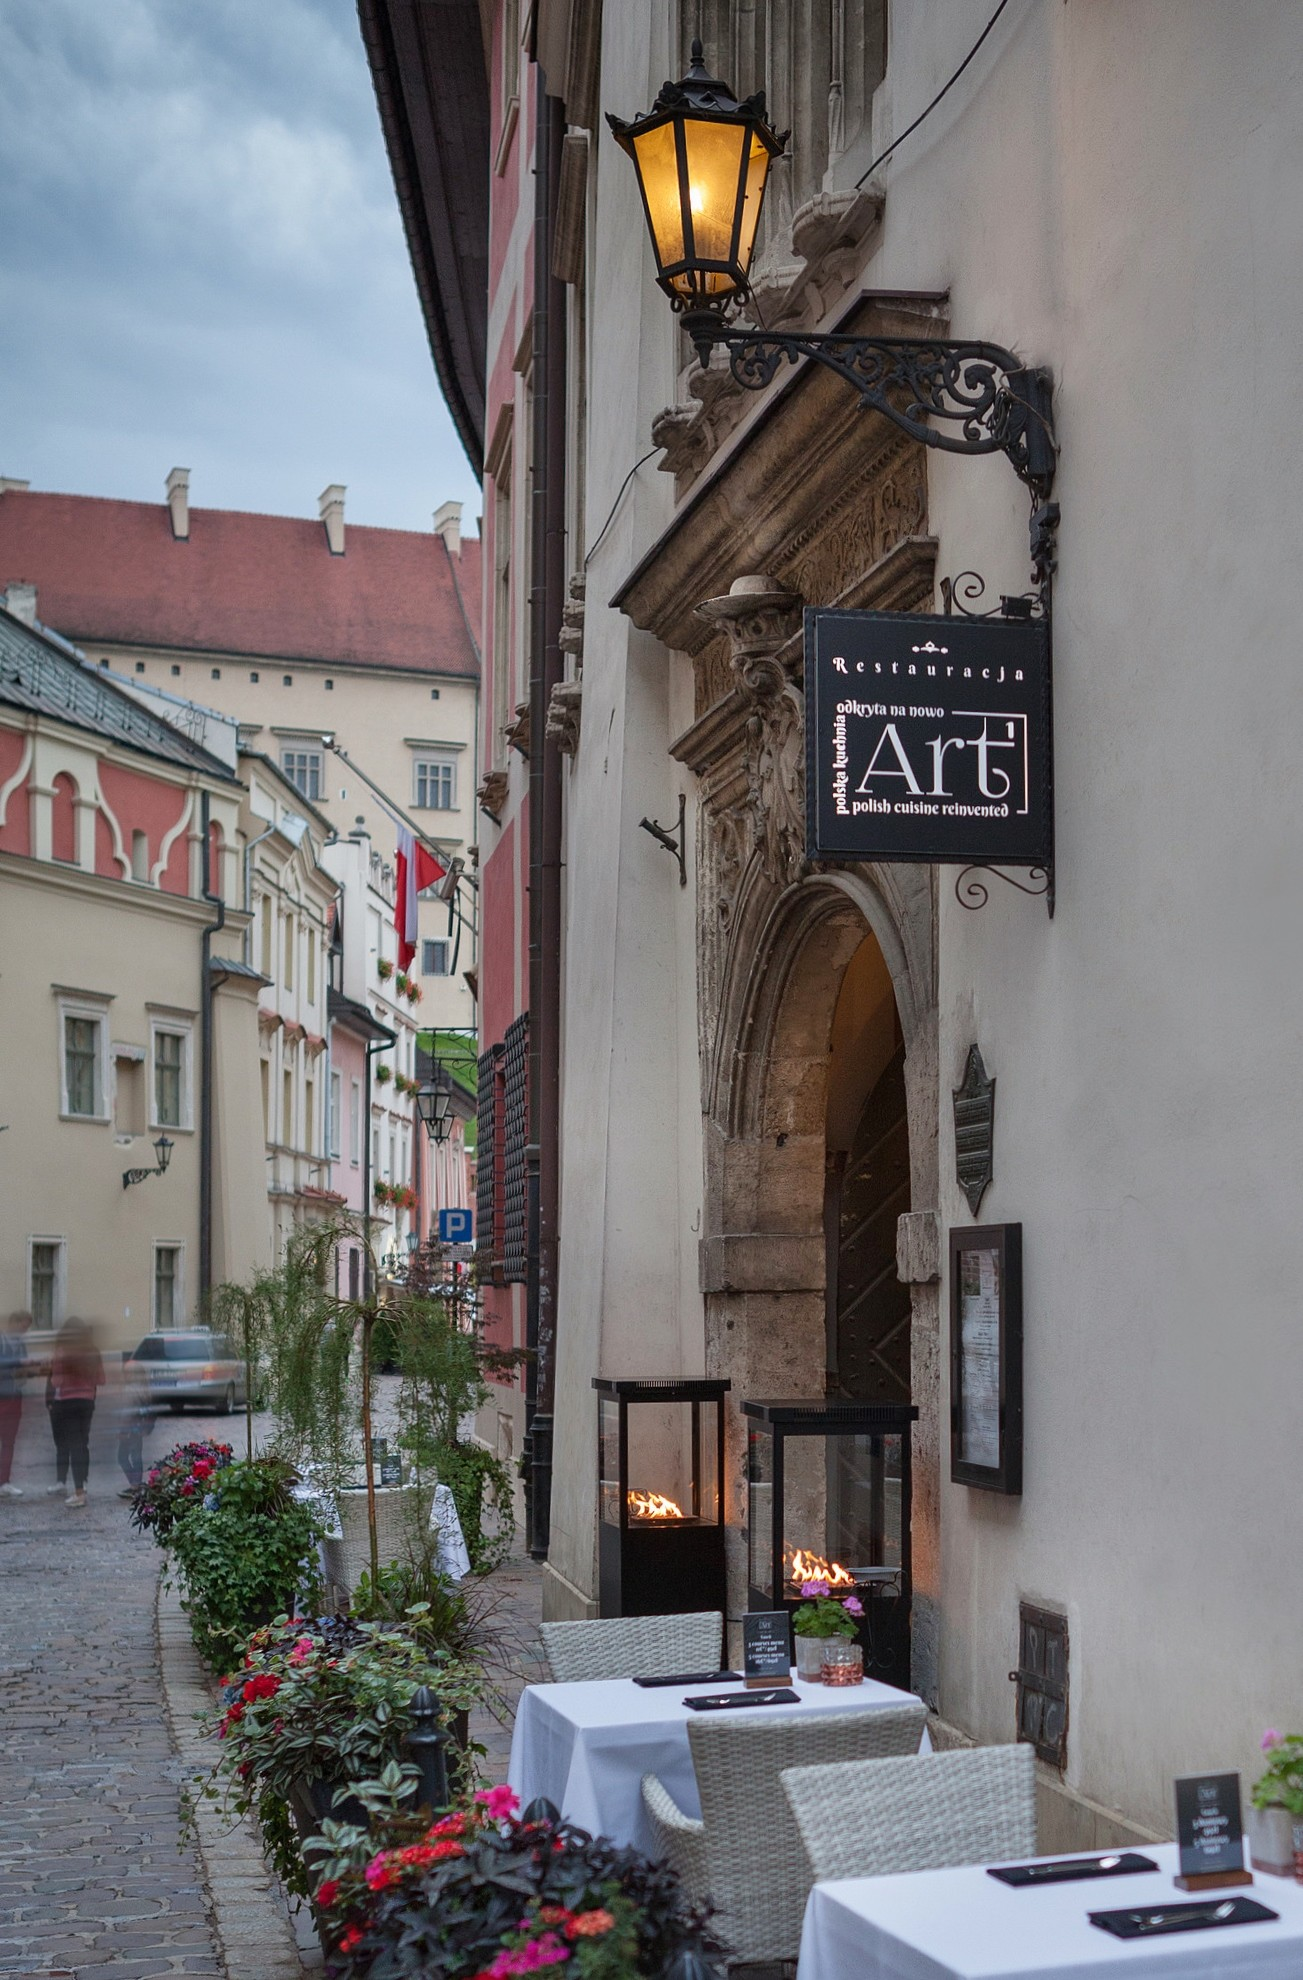 Restaurants Near Mehttpsillicitlistening Commicrosoft Com1 Microsoft Way Redmondhttpssupport Microsoft Comen Us: The Best Restaurants Near Wawel Castle In Kraków, Poland